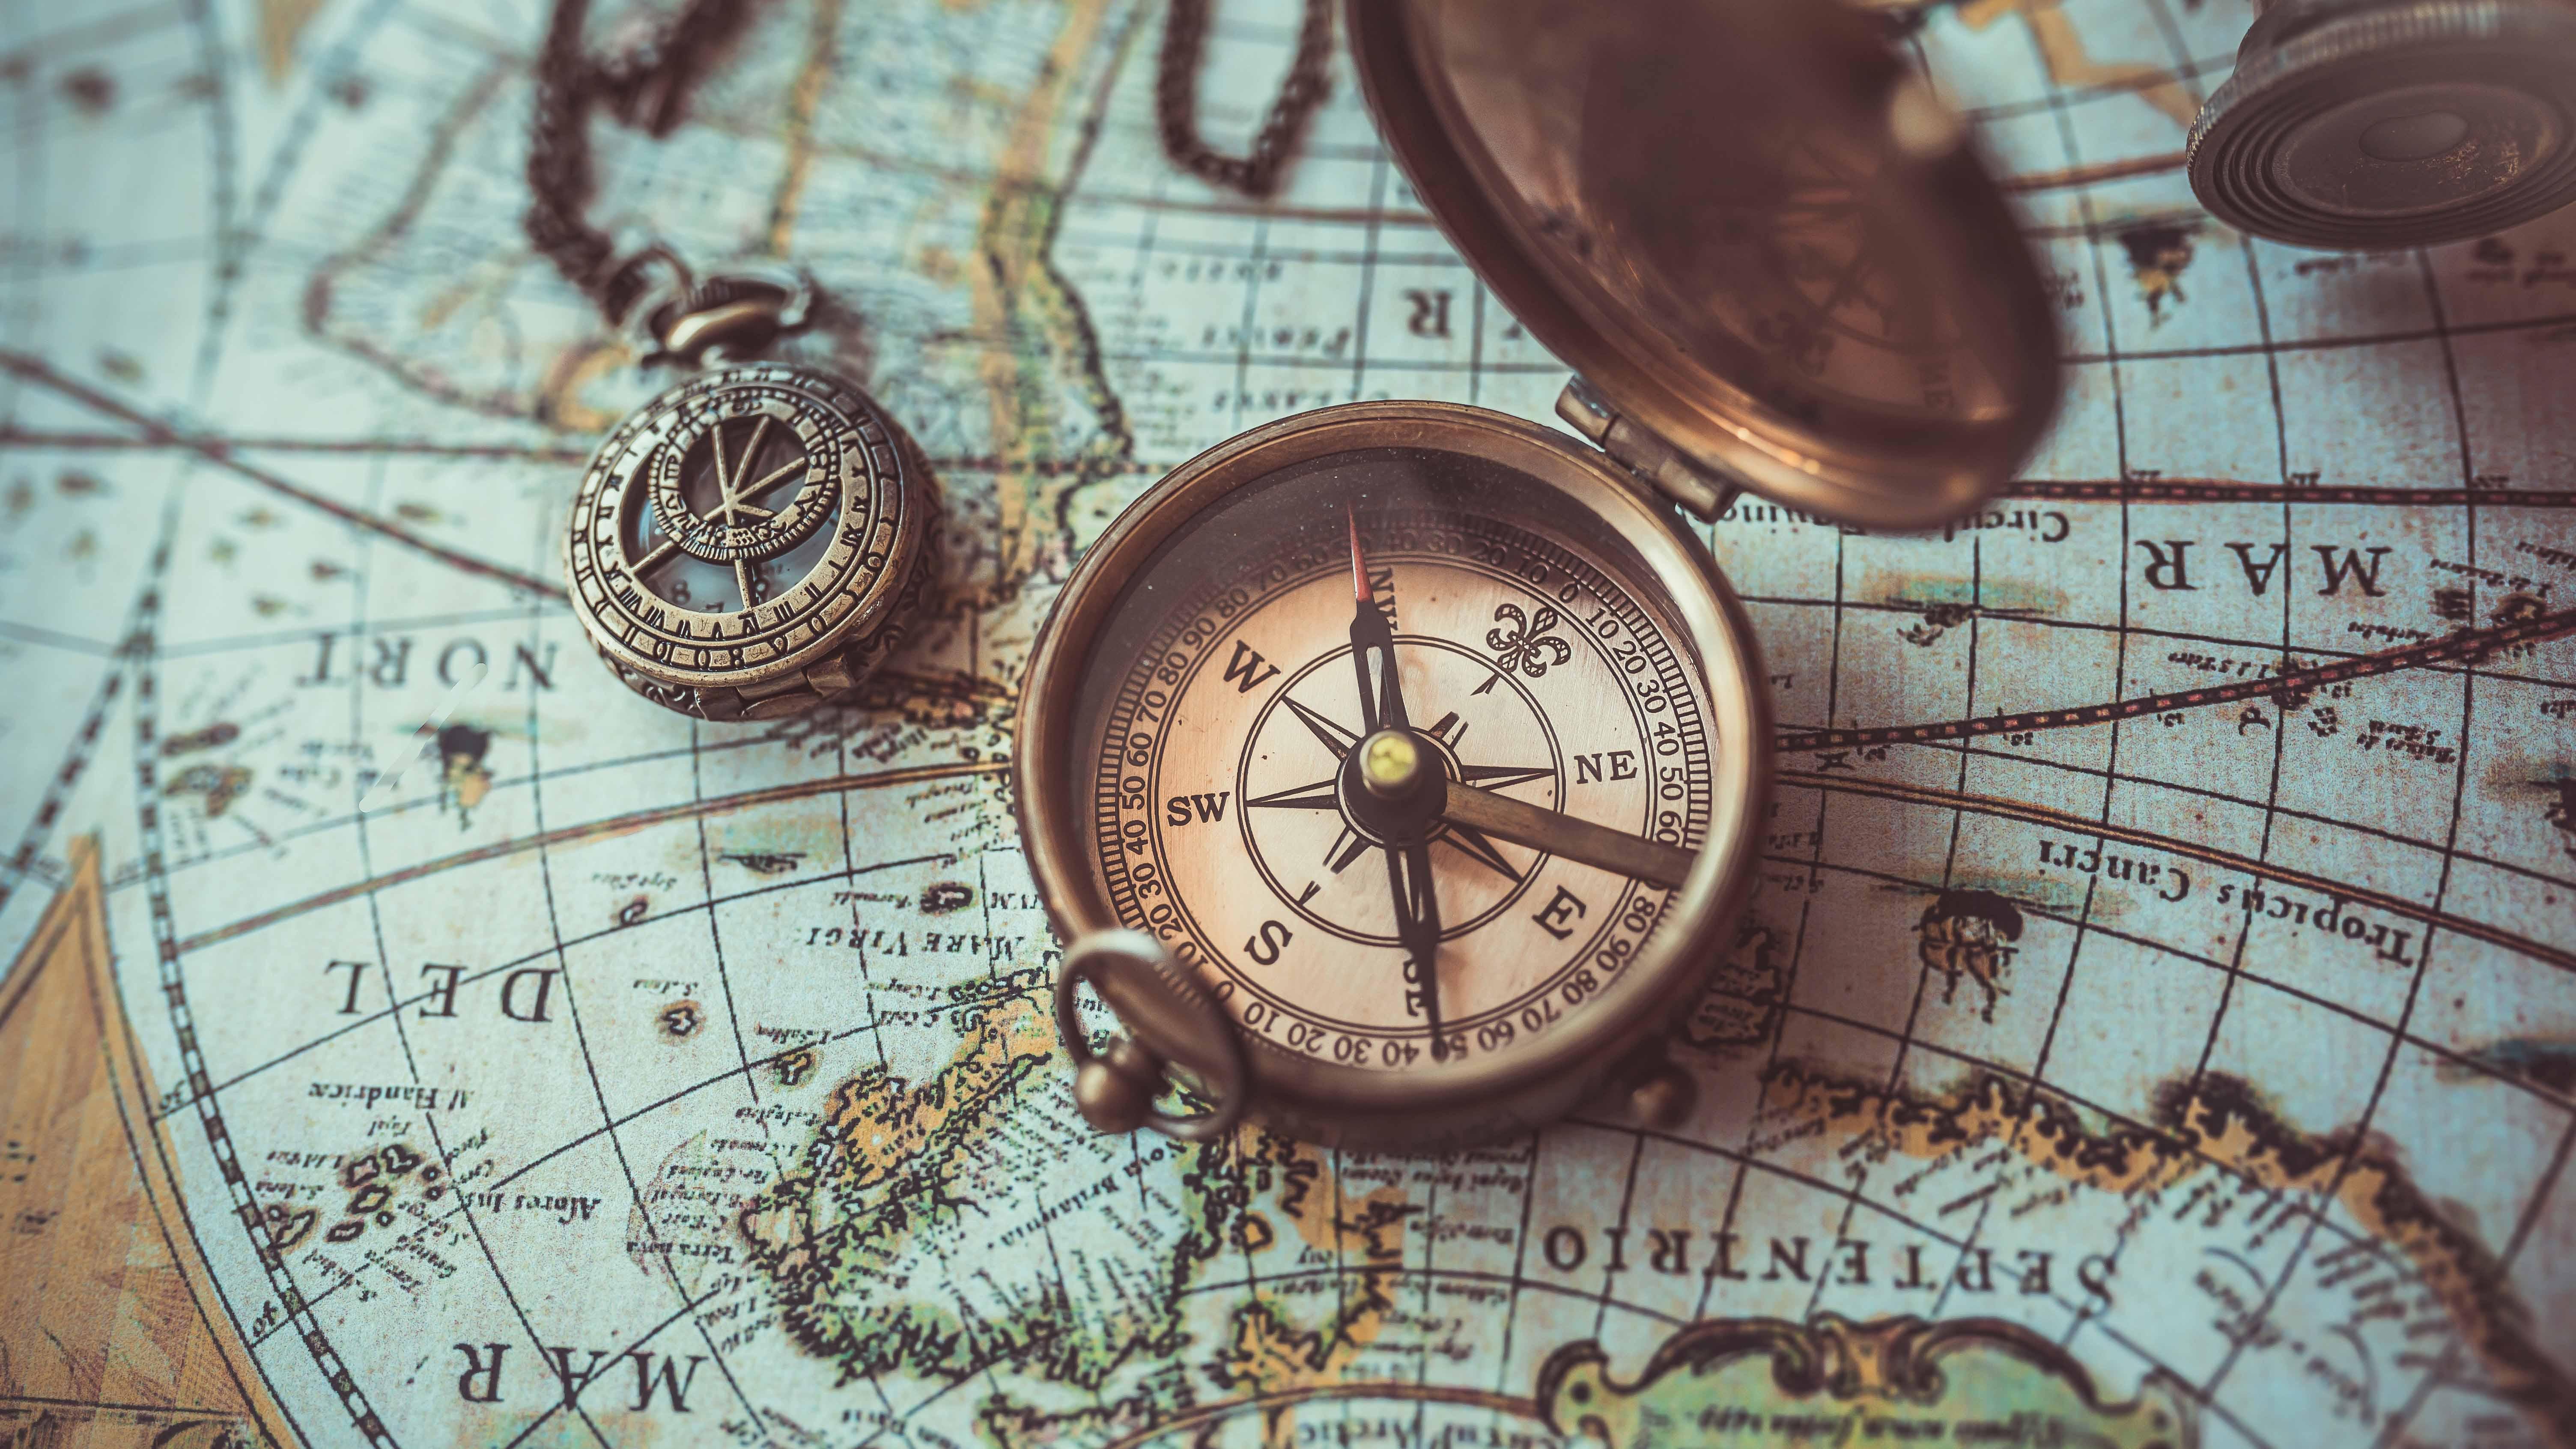 10 Great Examples of Website Navigation Design